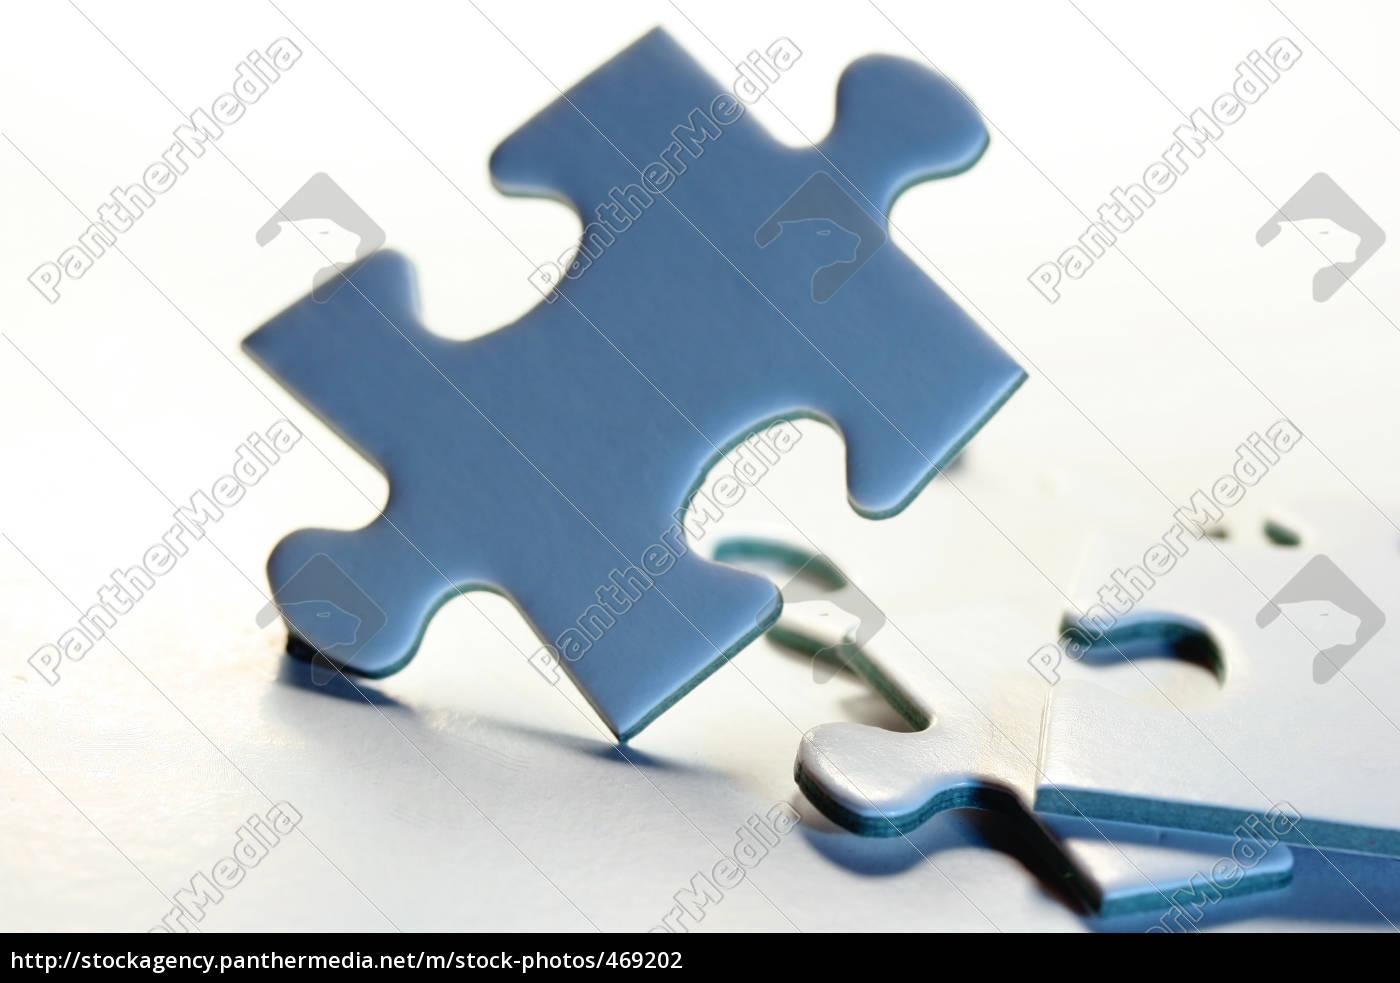 puzzle, pieces - 469202